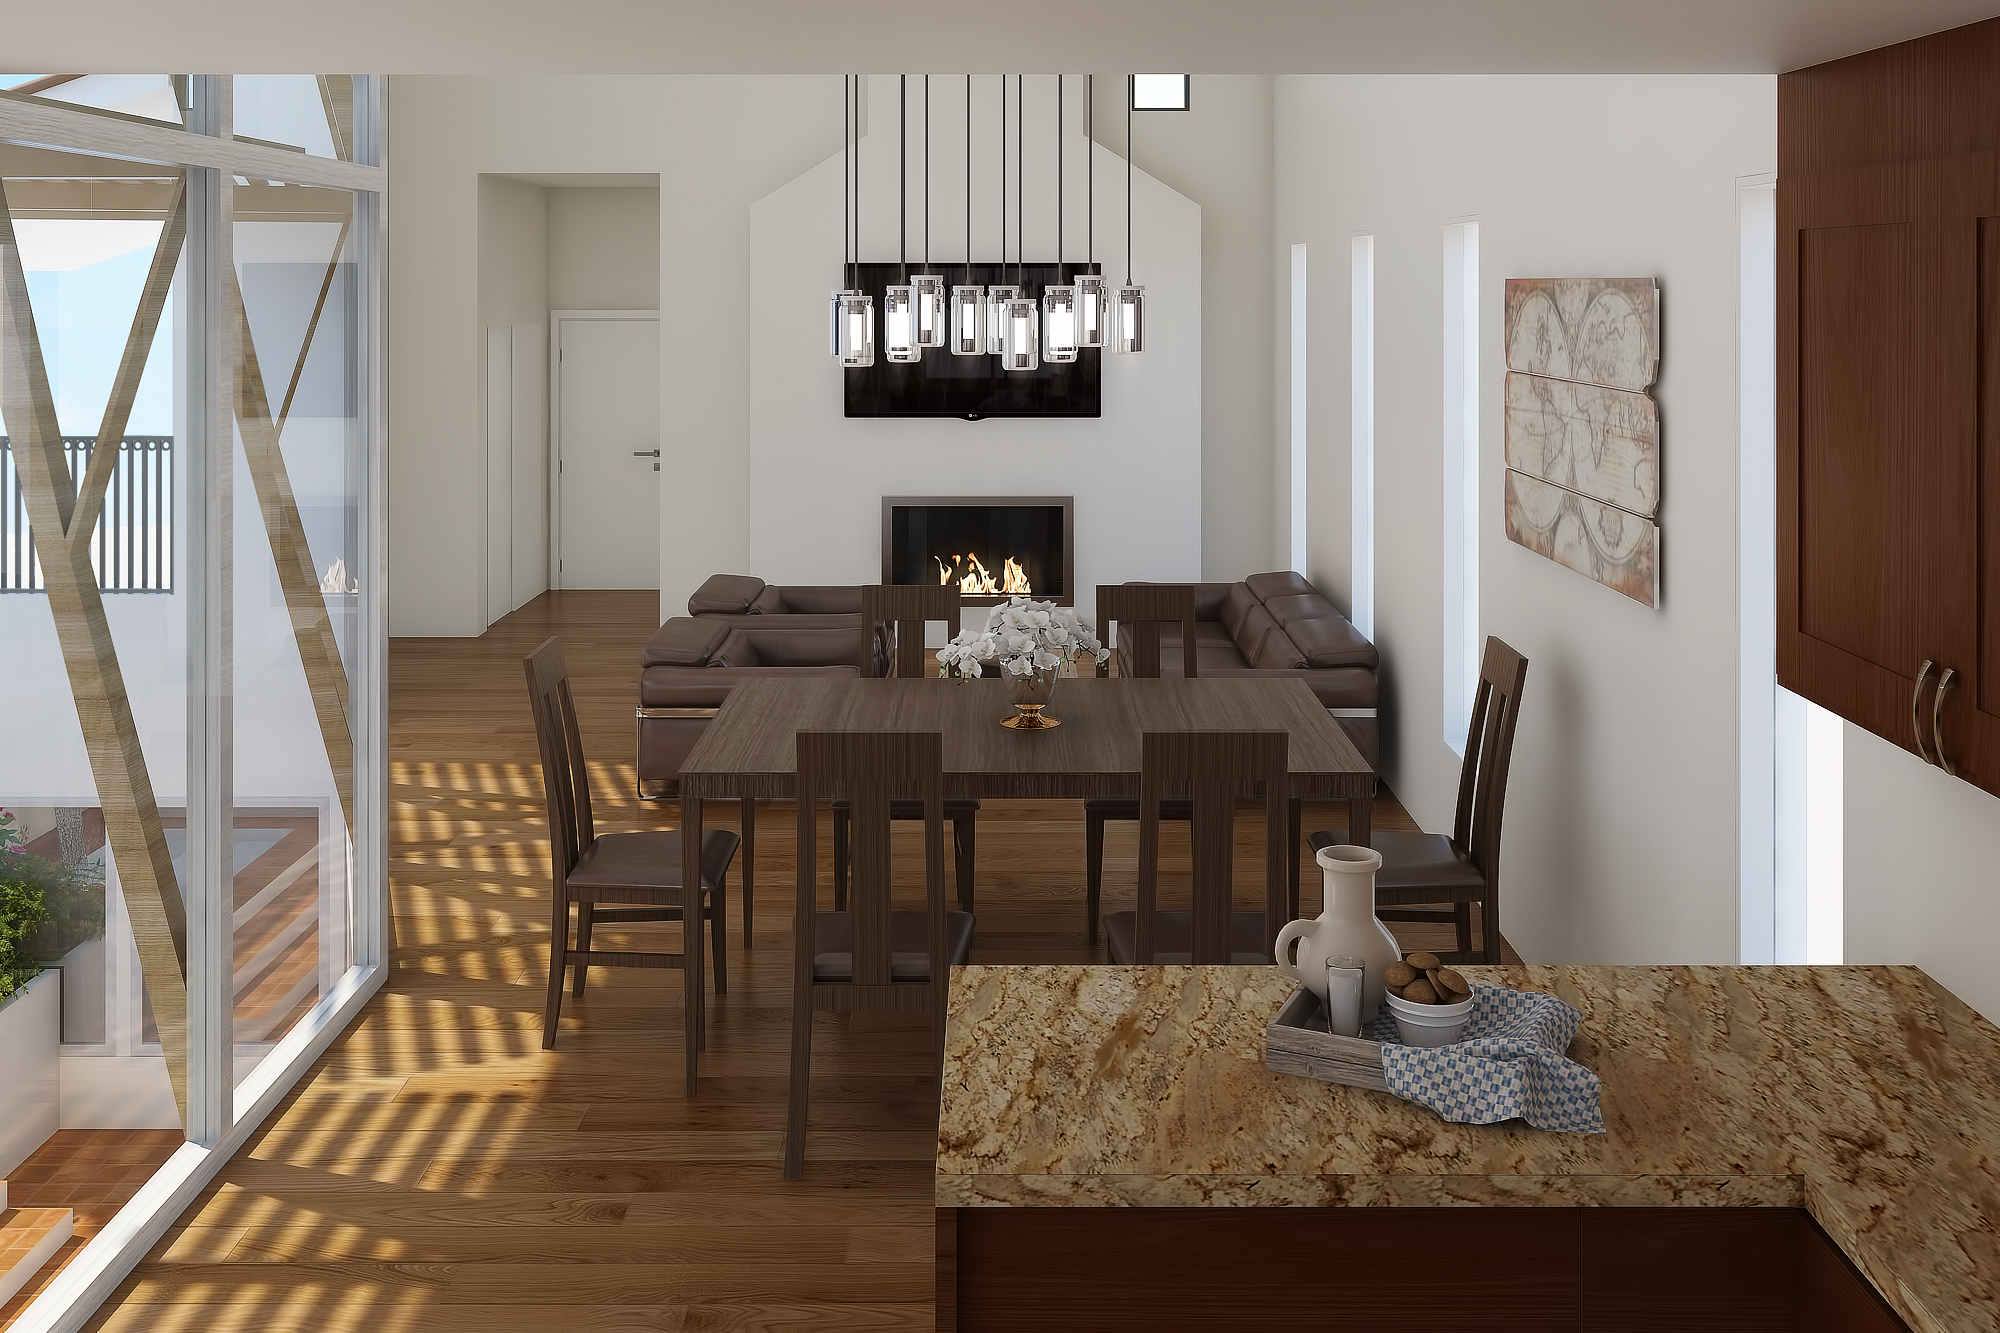 kitchen_Living_View_02 - 10-30.jpg